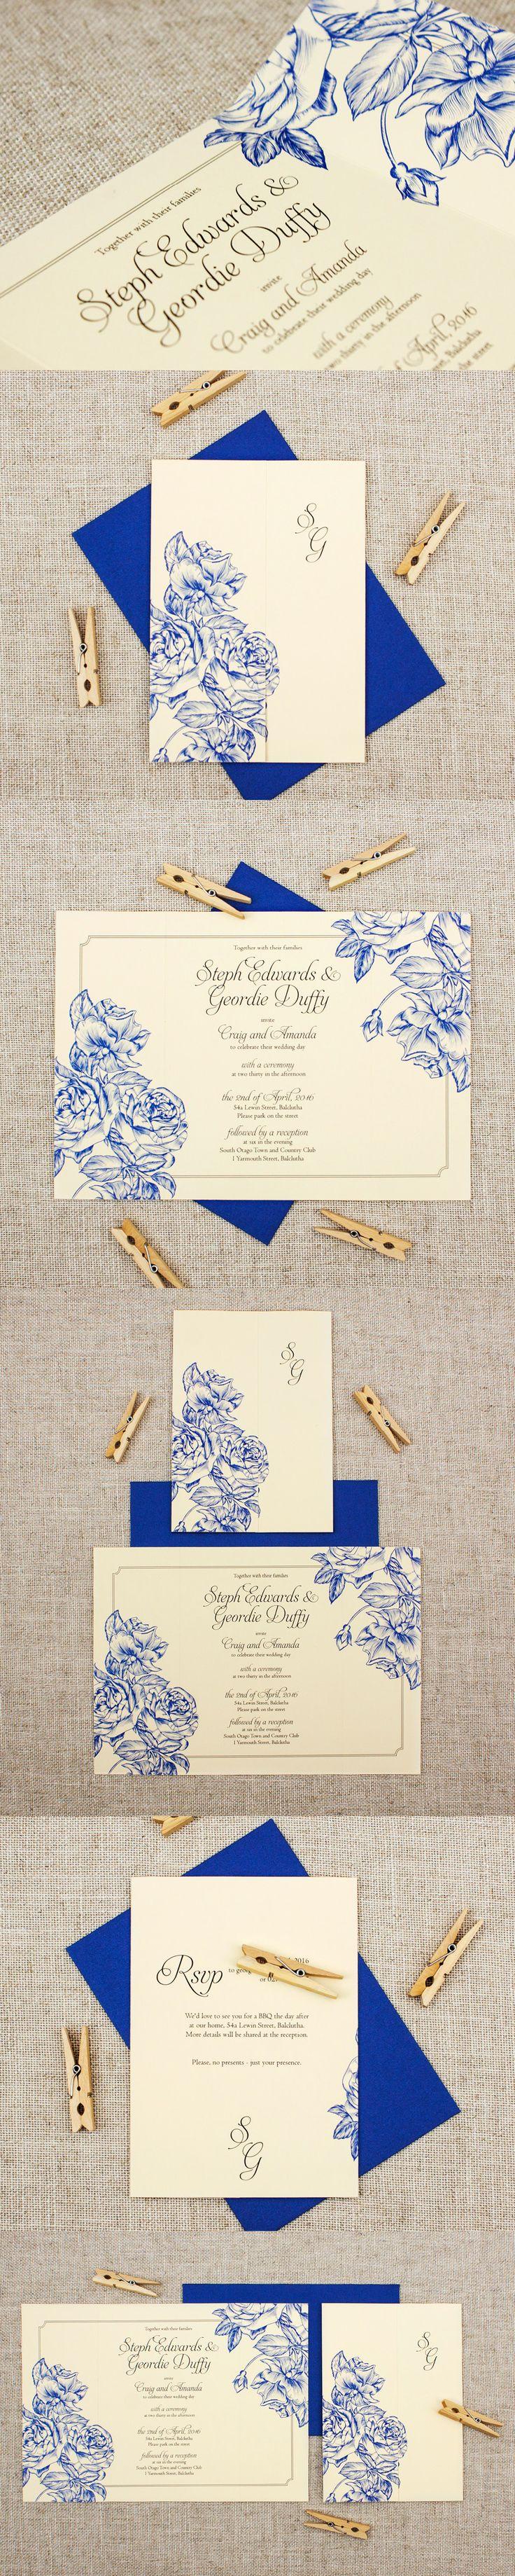 Cream Wedding Invitation Suite with Blue Roses for Garden Wedding